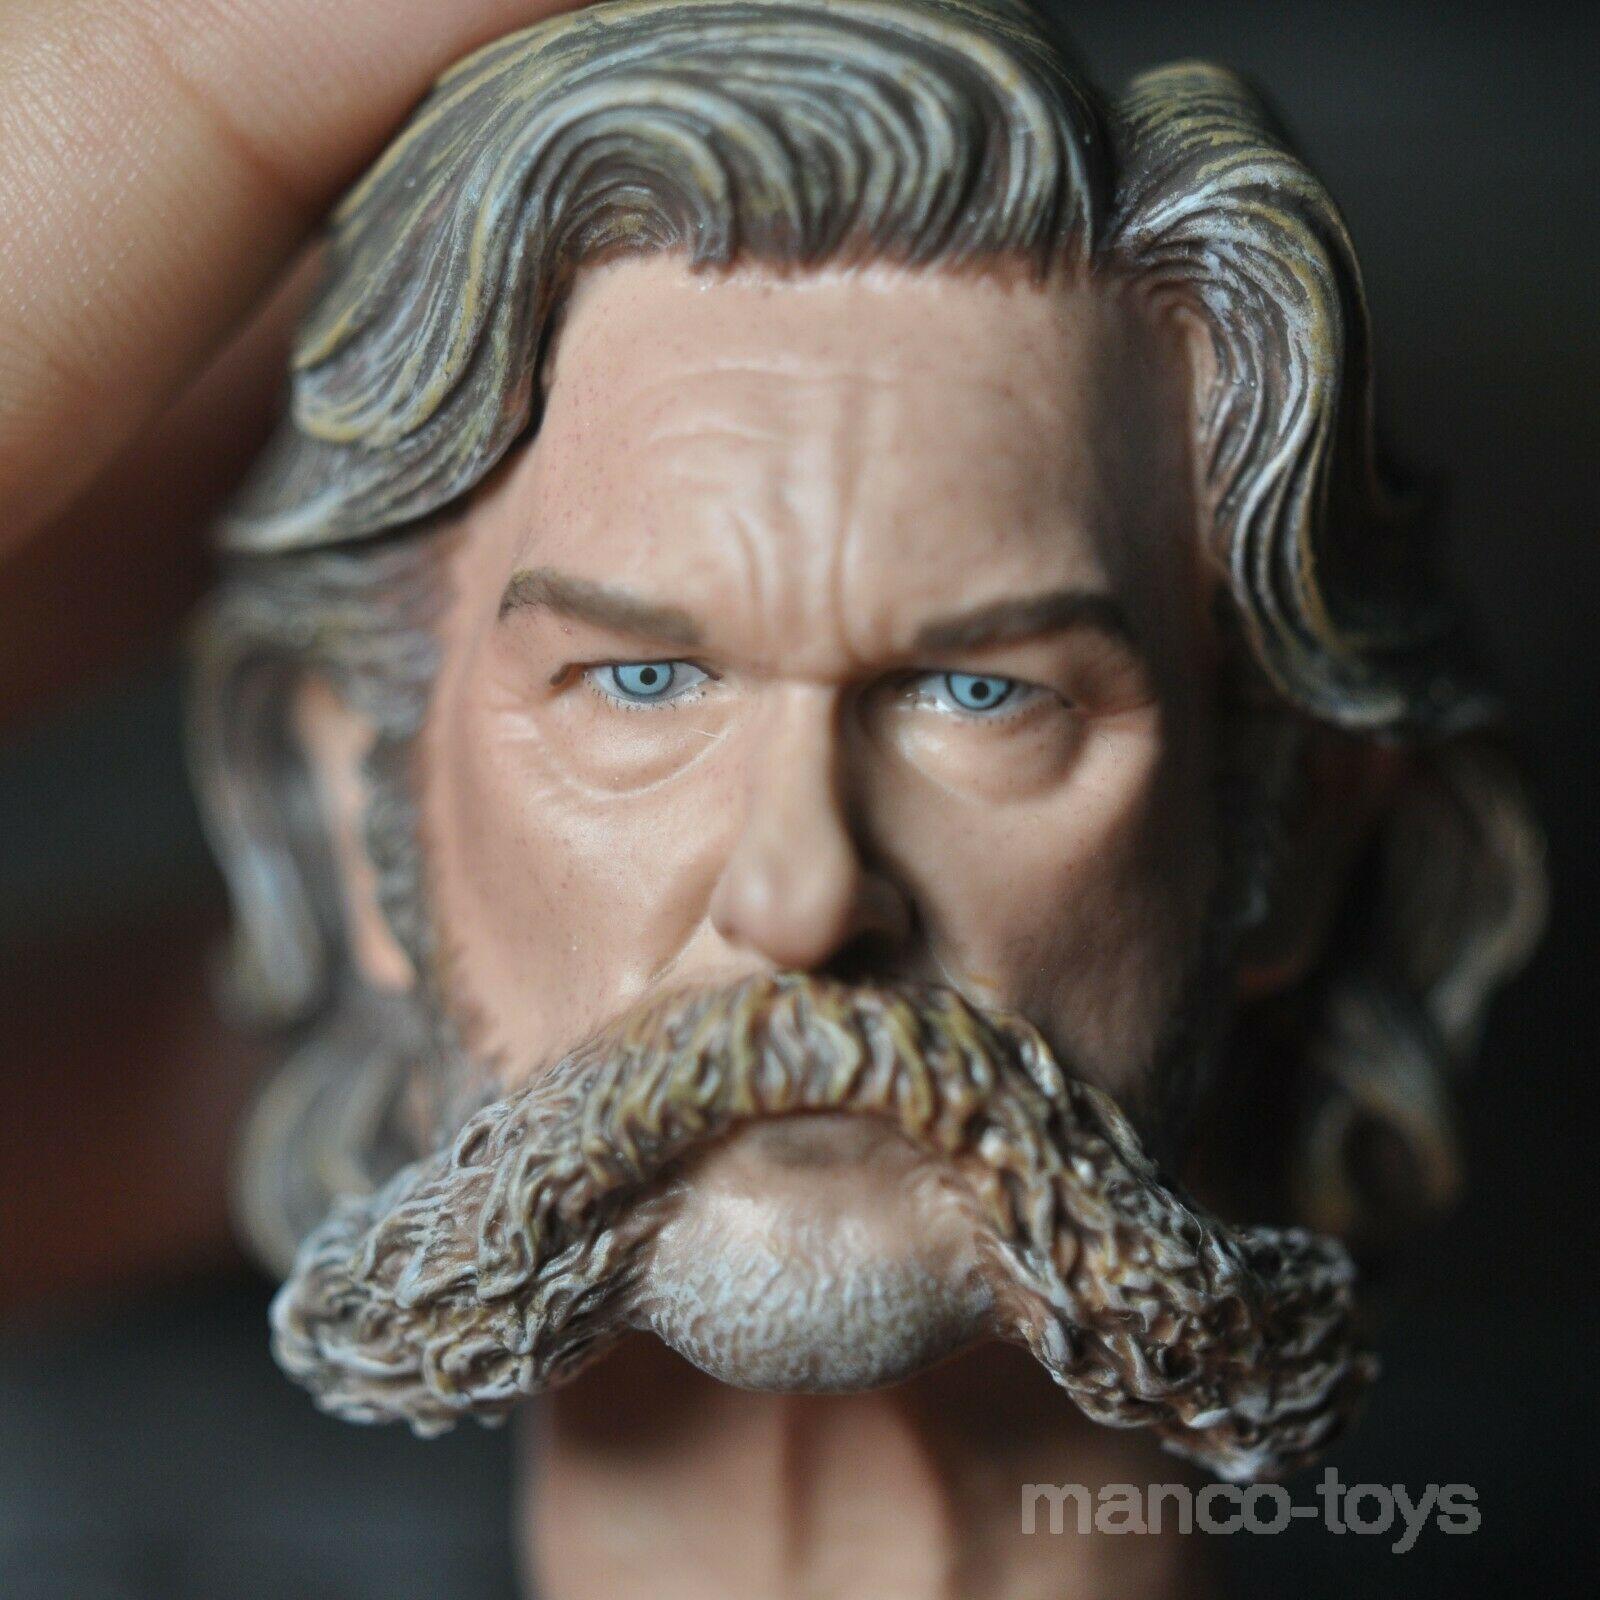 1 6 Scale Head Sculpt Kurt Russell The Hateful Eight Male Head Sculpt Toys Action Toy Figures Aliexpress